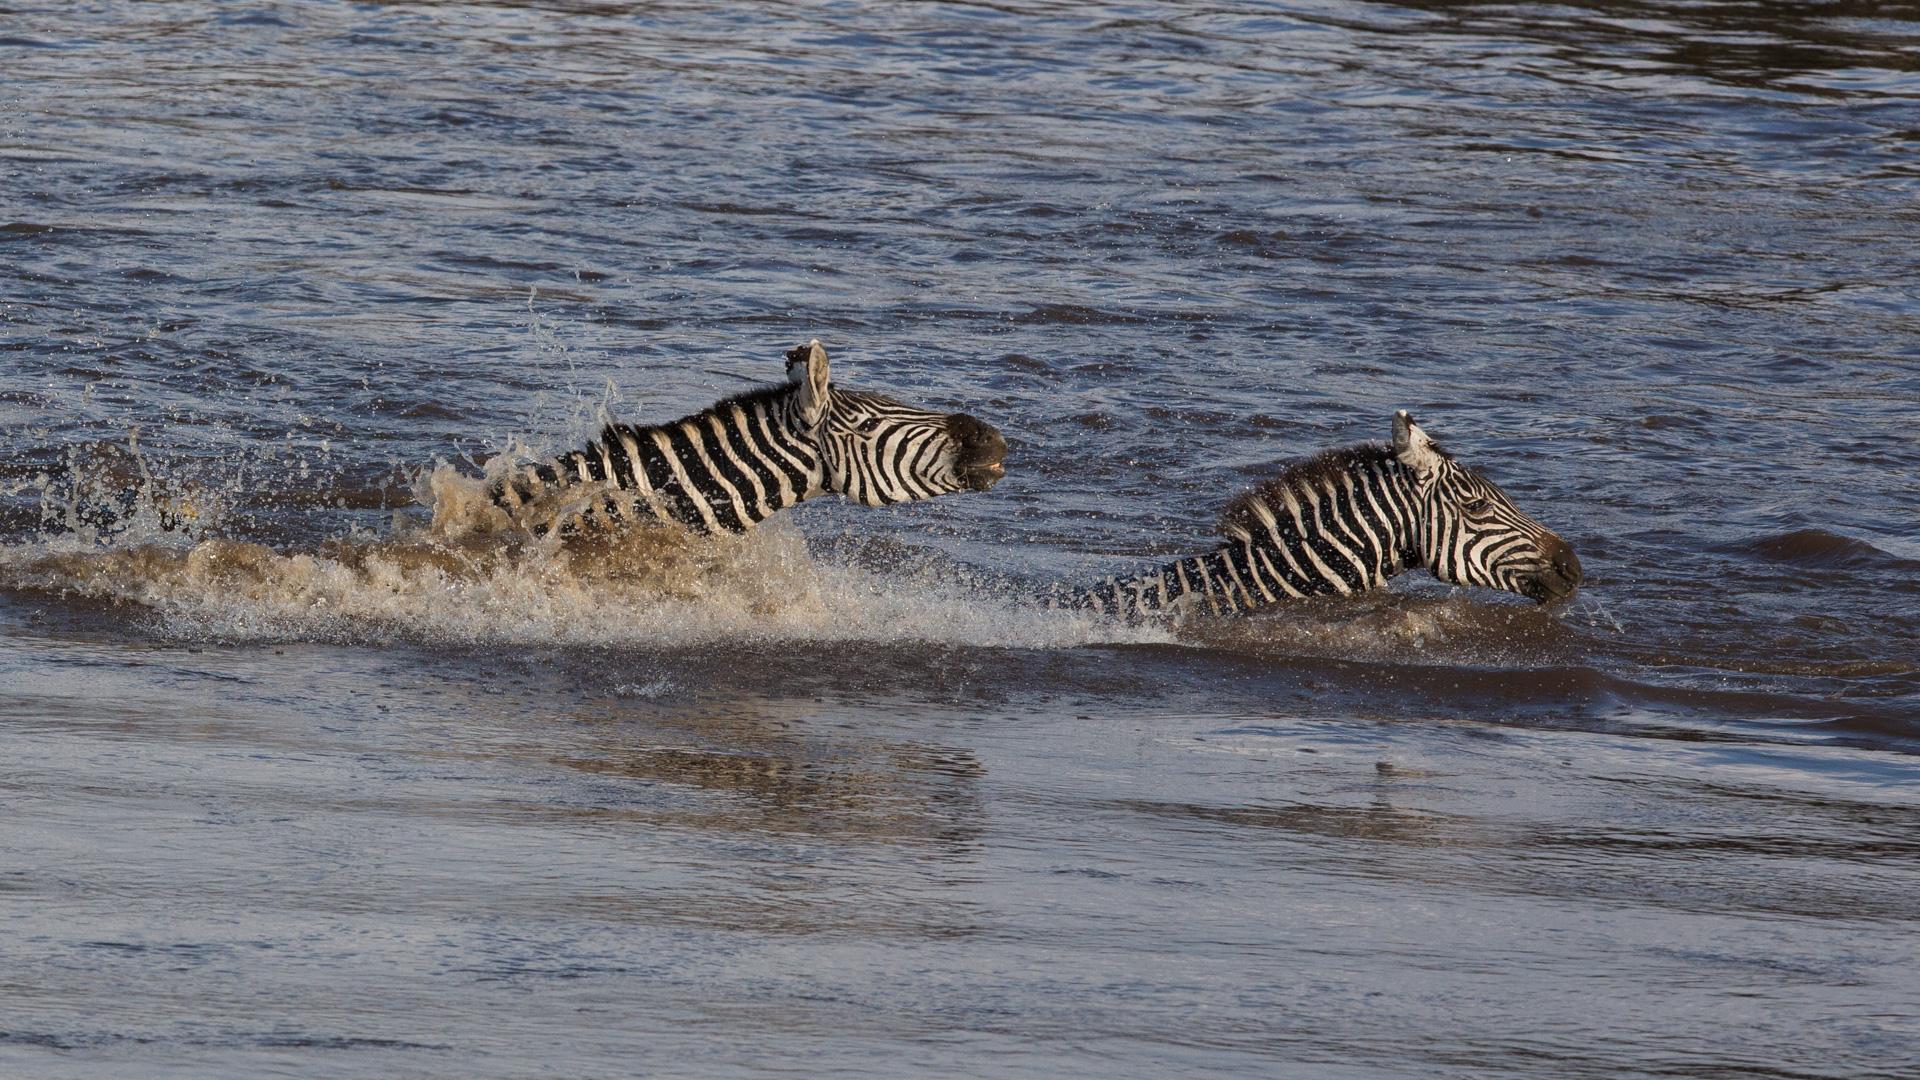 Zebras and crocodile